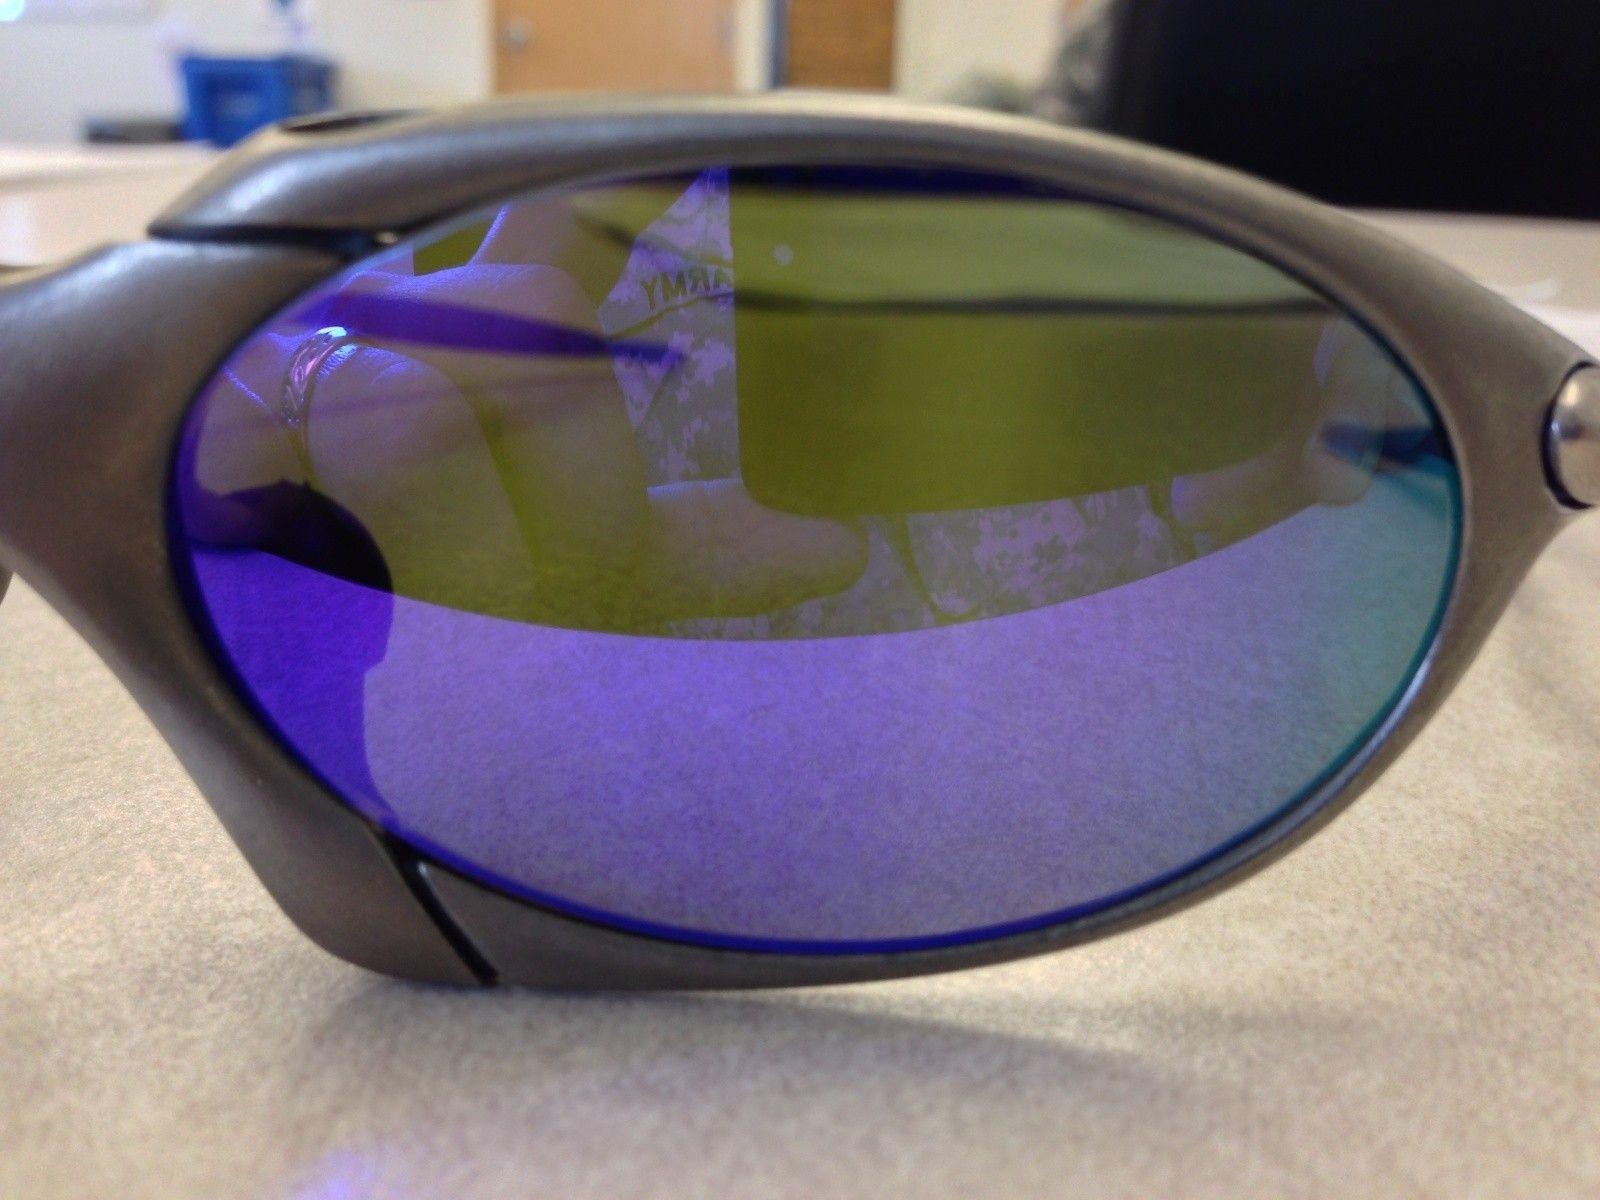 Titanium R1 For Plasma R1 - hrlwxs.jpg